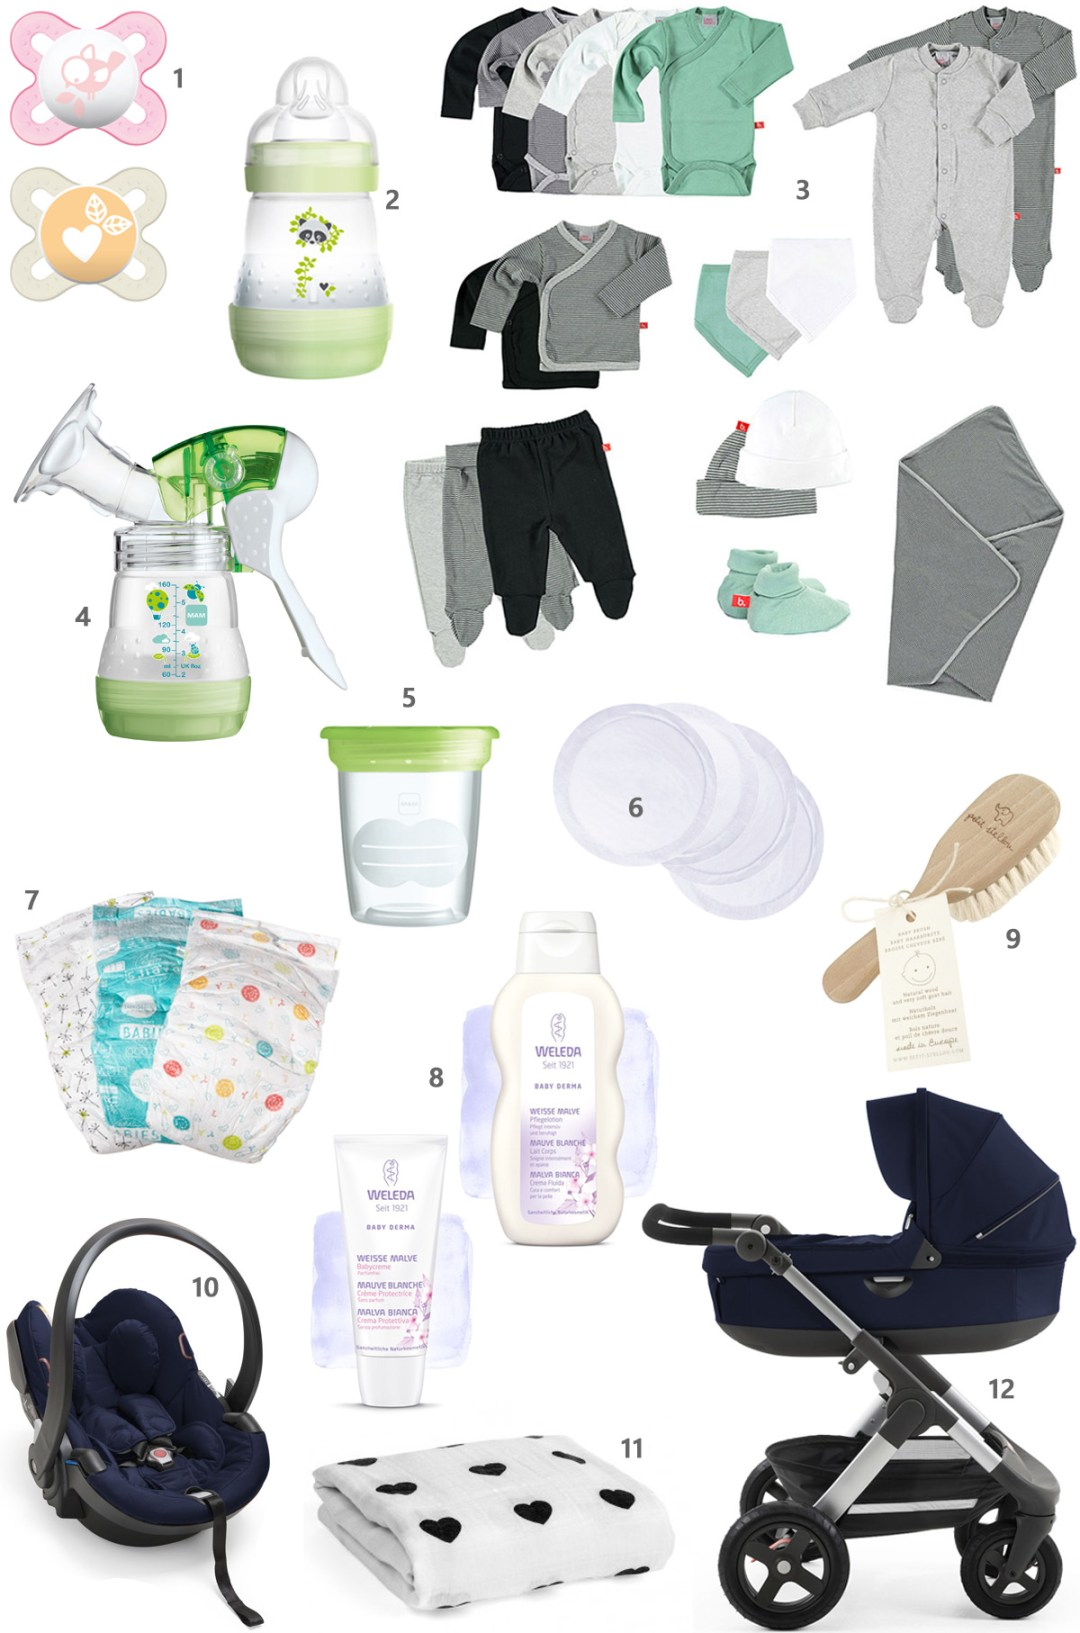 Mini & Stil, Mama Blog Schweiz, Familien Blog, Baby Blog, Baby Erstausstattung, mam